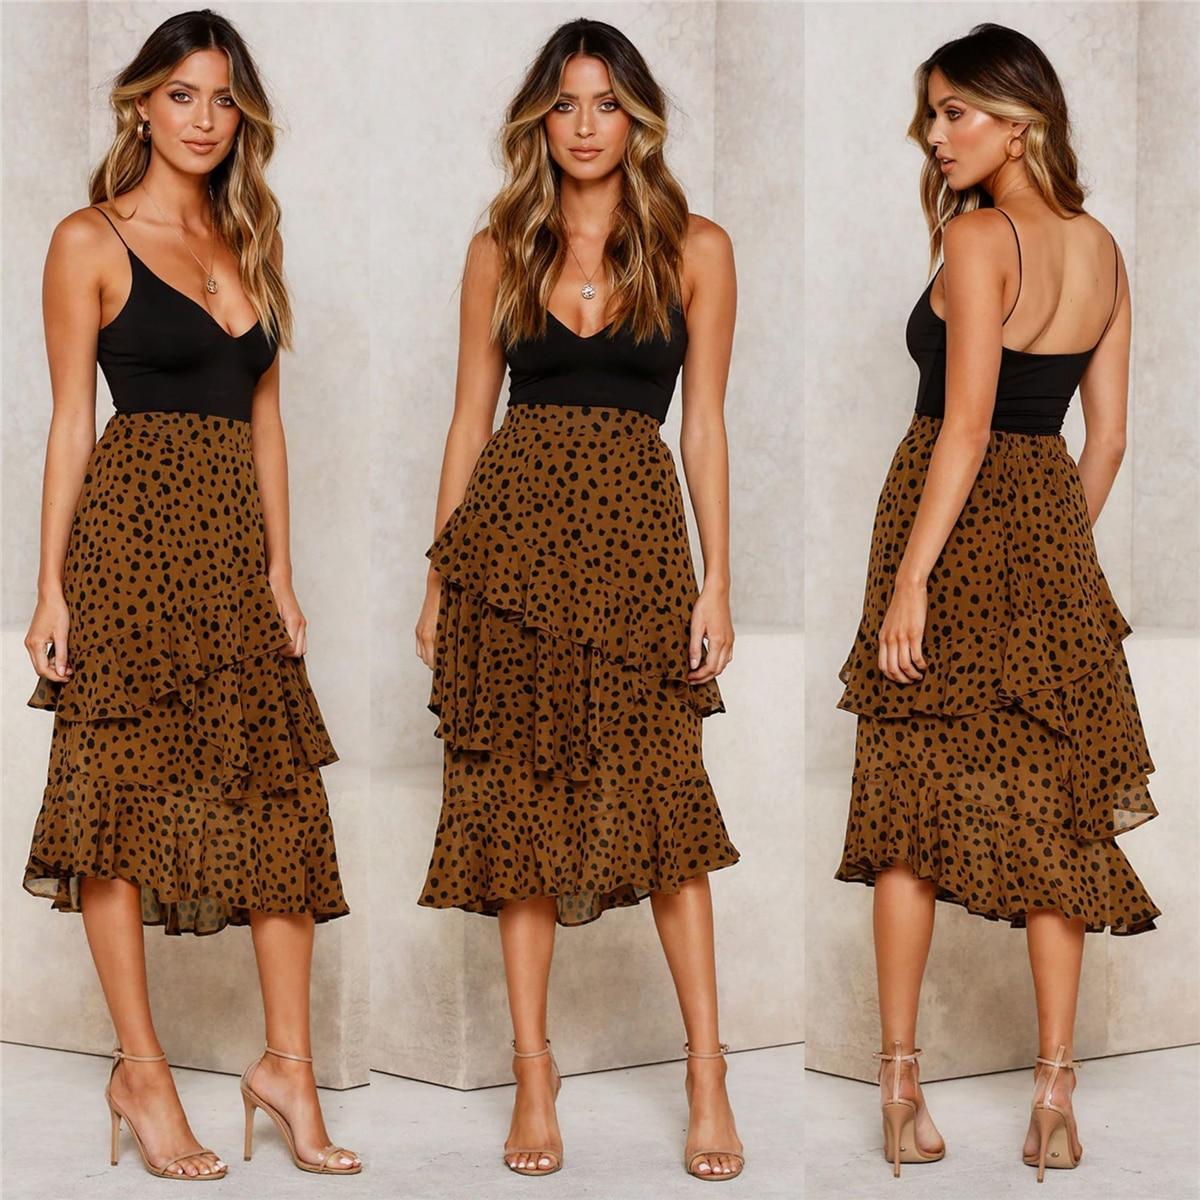 Hirigin Autumn Winter Fashion Leopard Ruffle Long Skirts Women Casual Chic Asymmetry Clothes Lady Beautiful Party Skirt